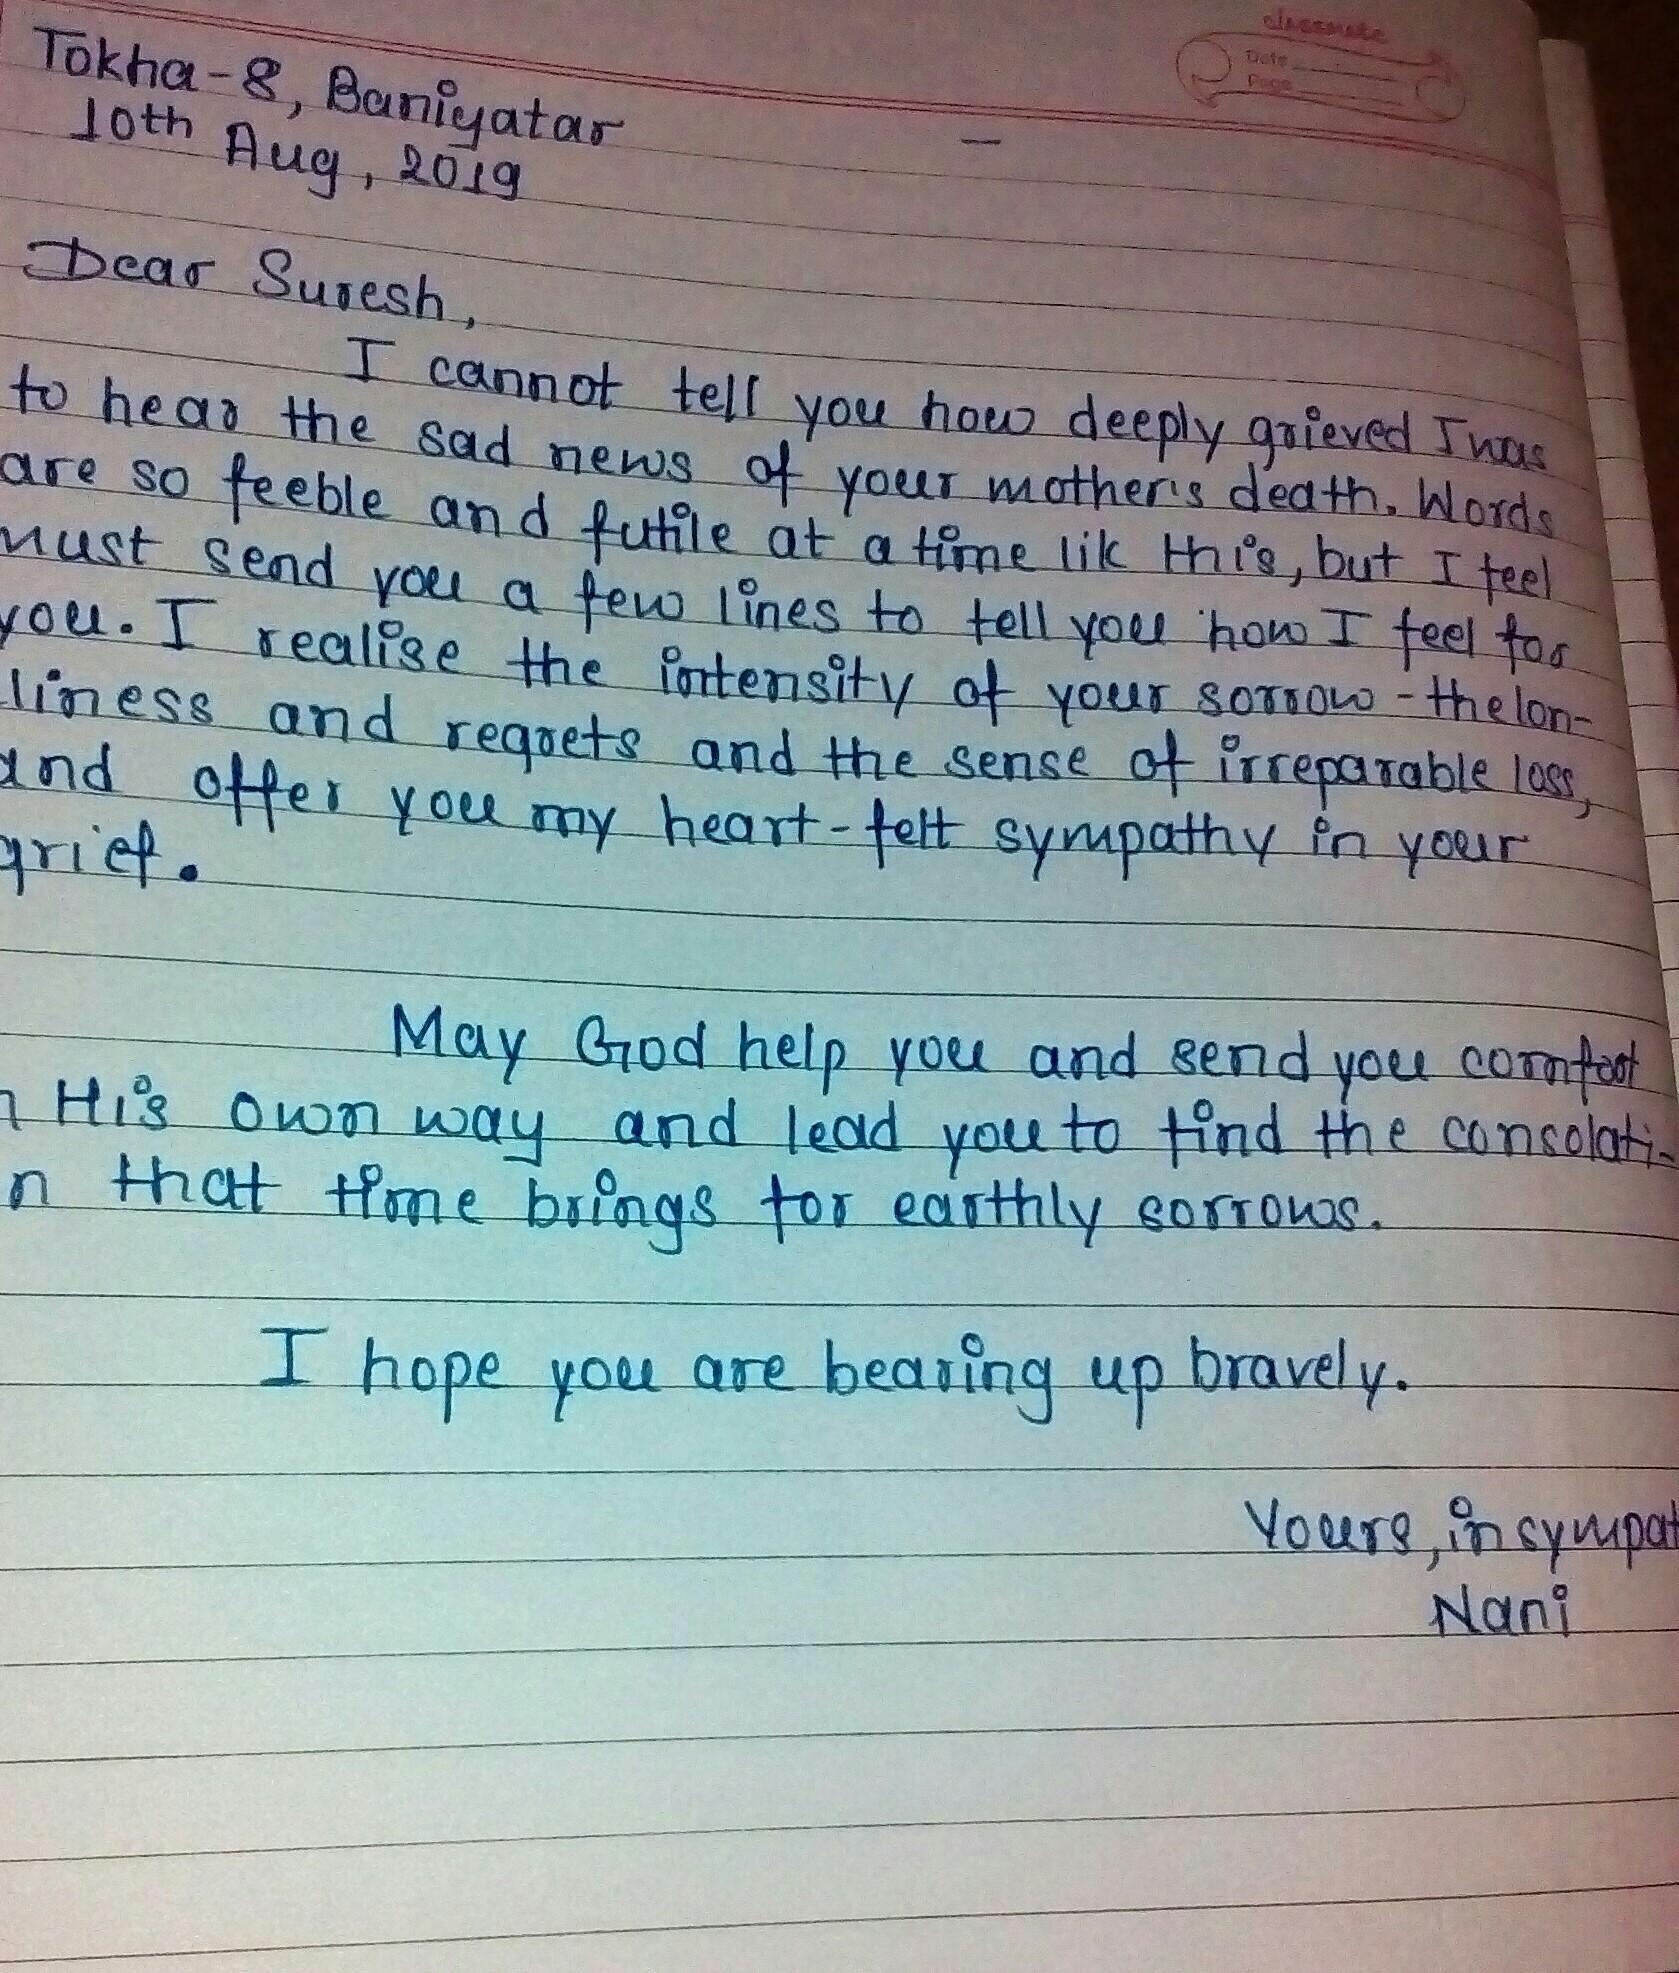 condole the death of a friends mother write a condolence